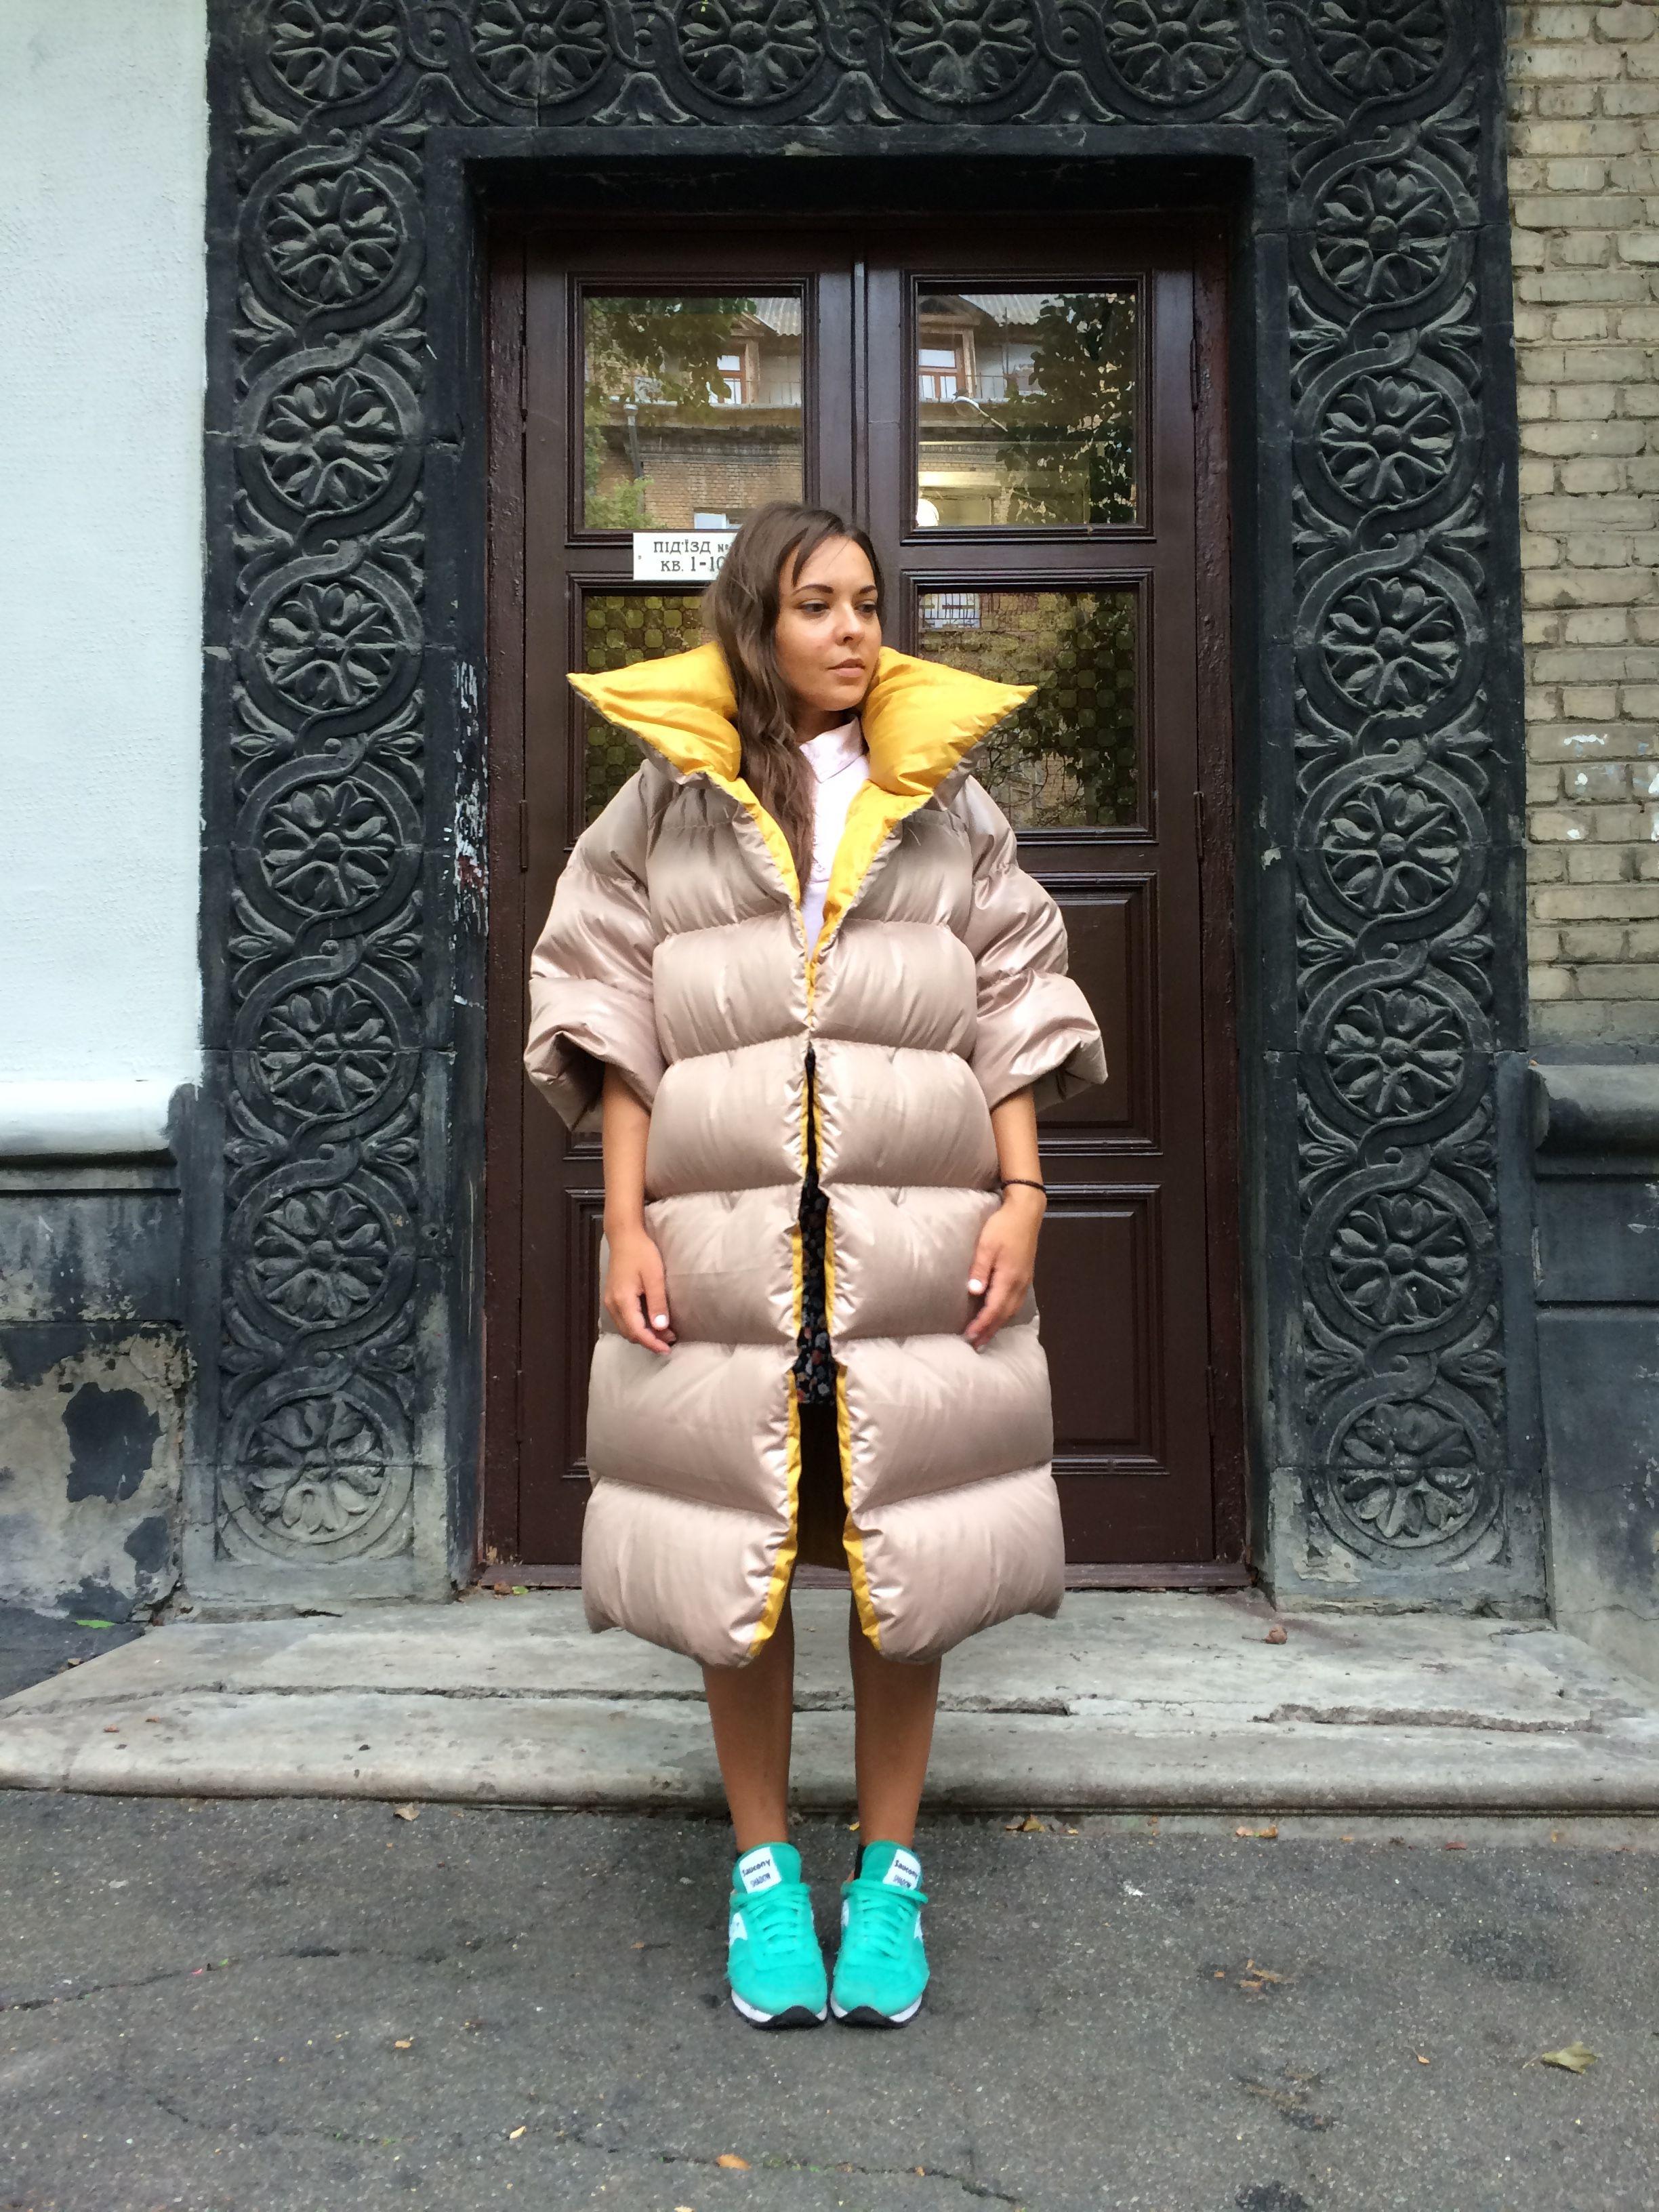 Down coat. Oversize puffer coat MARCHI, Fill Power 800  пуховиk  down   oversize  marchi 4c1faed188f